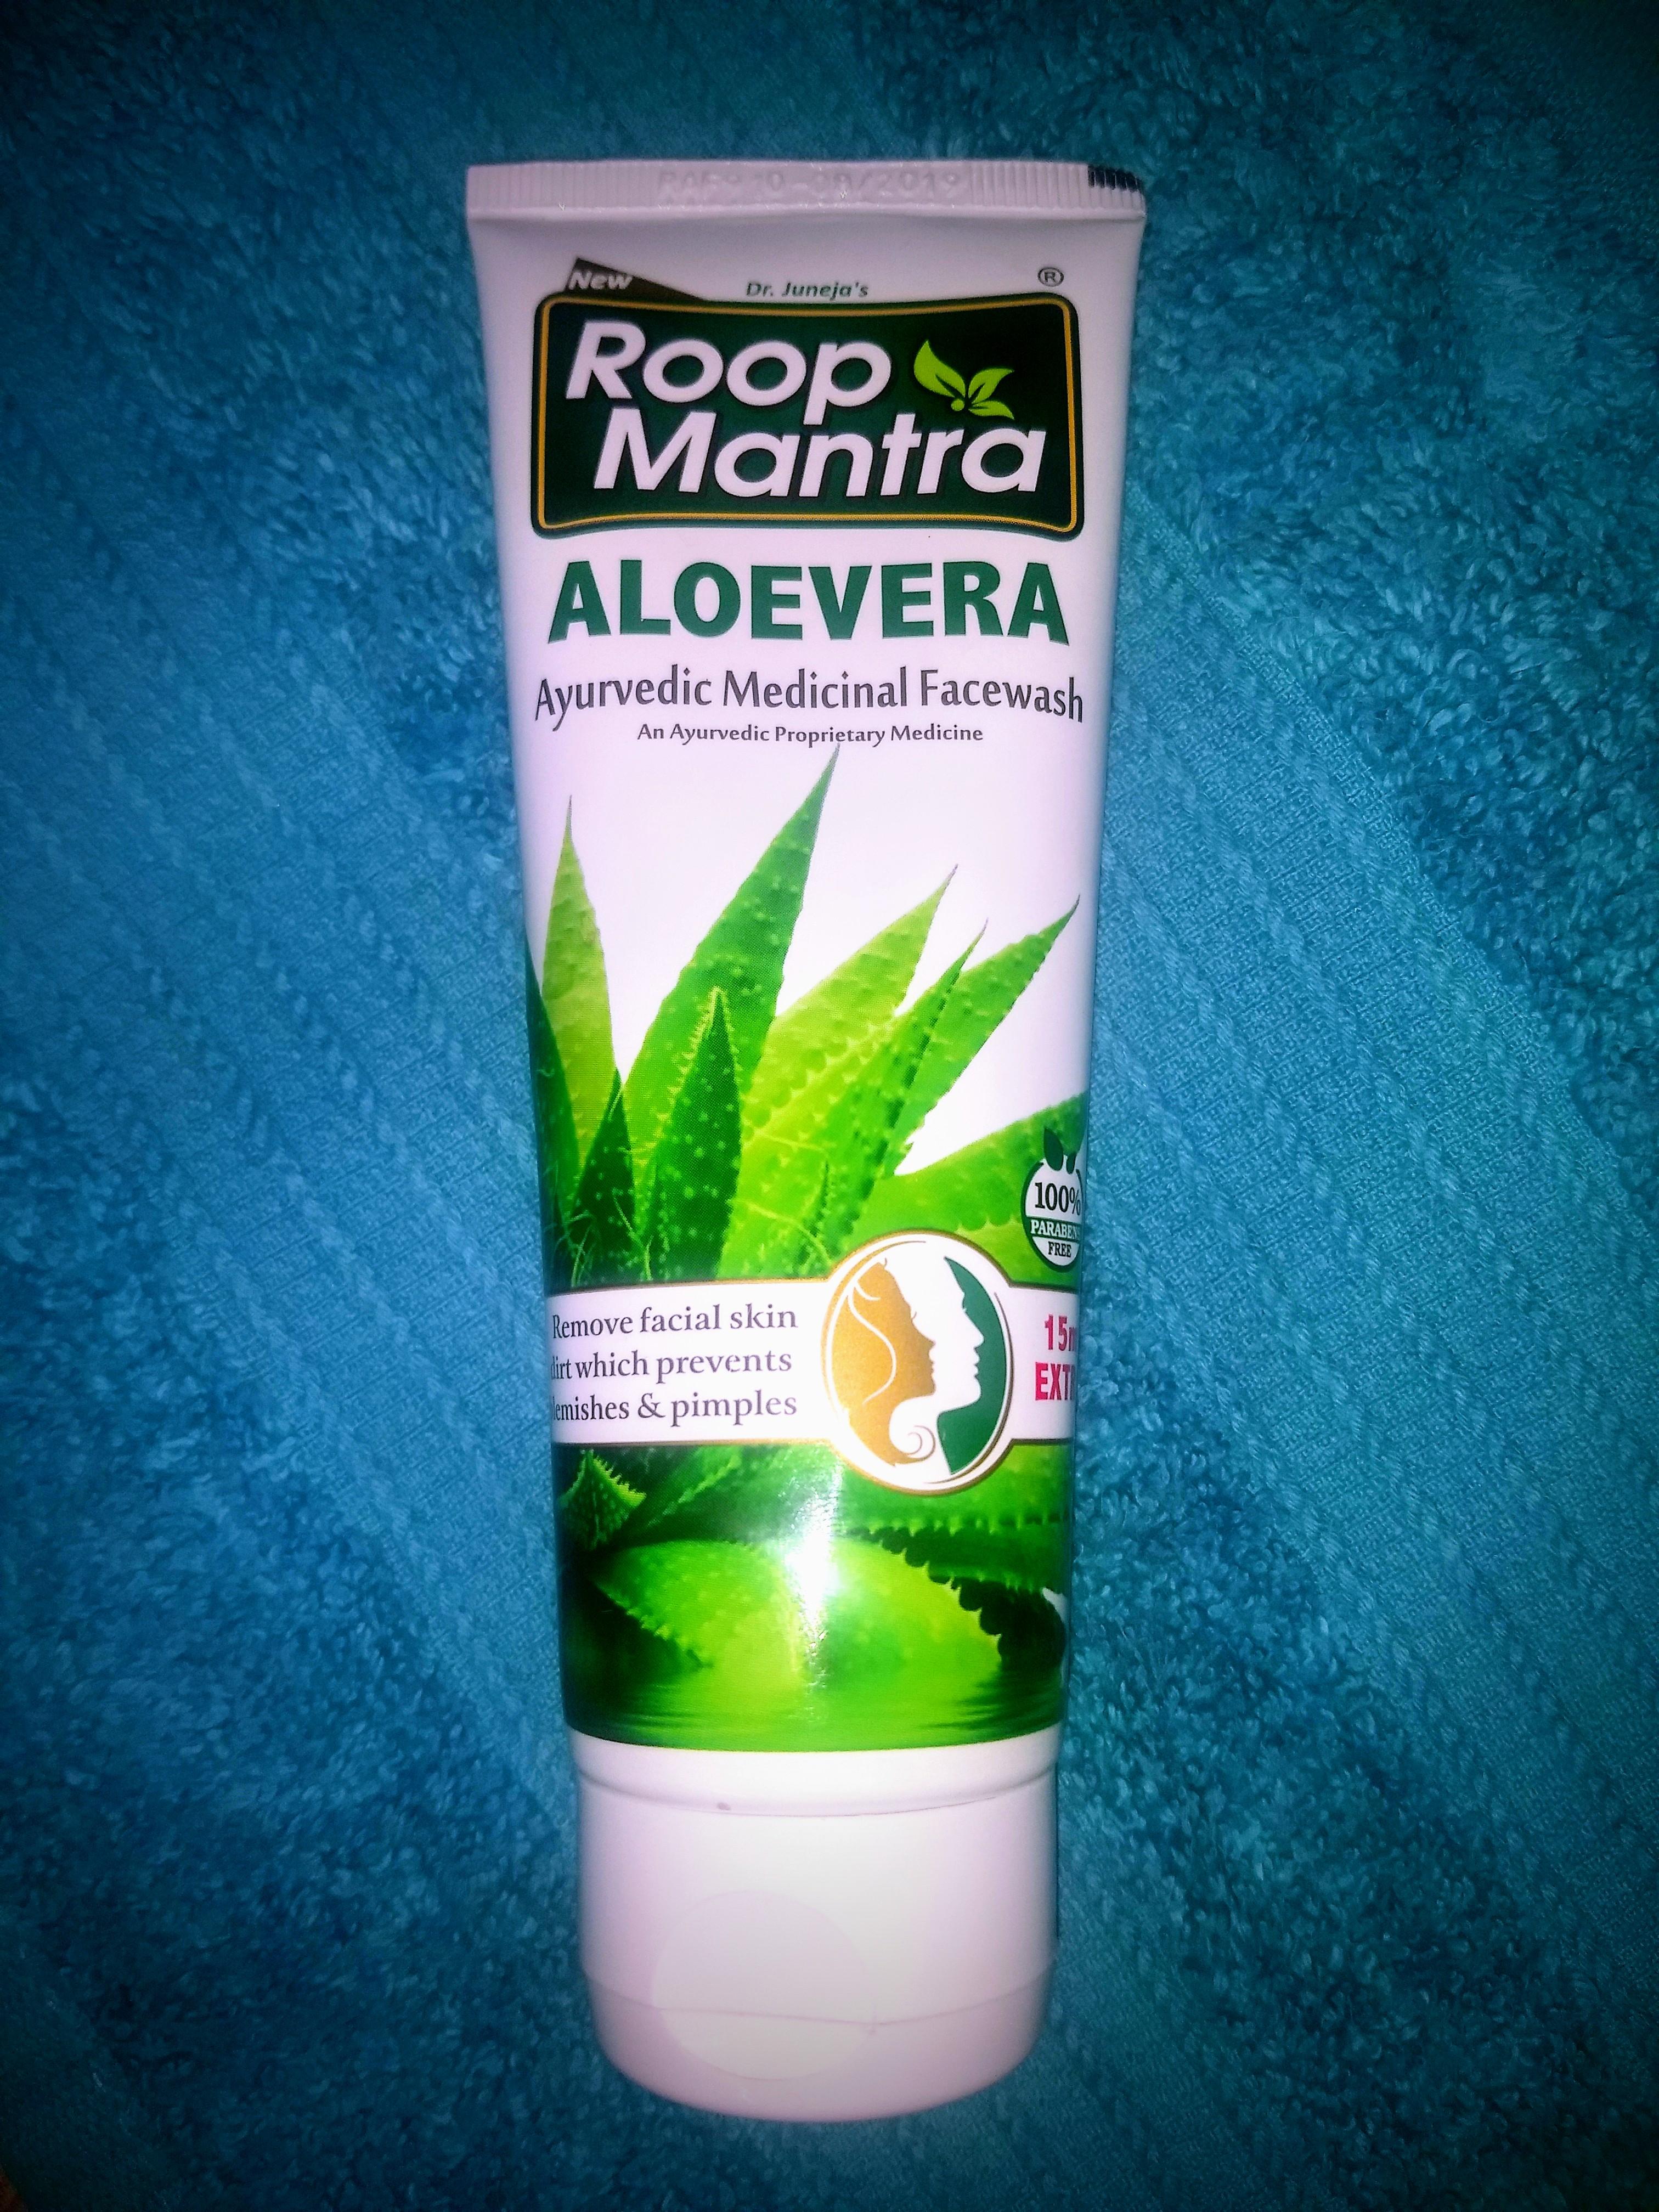 Roop Mantra Aloe Vera Face Wash-Best facewash for oily skin-By mayanka